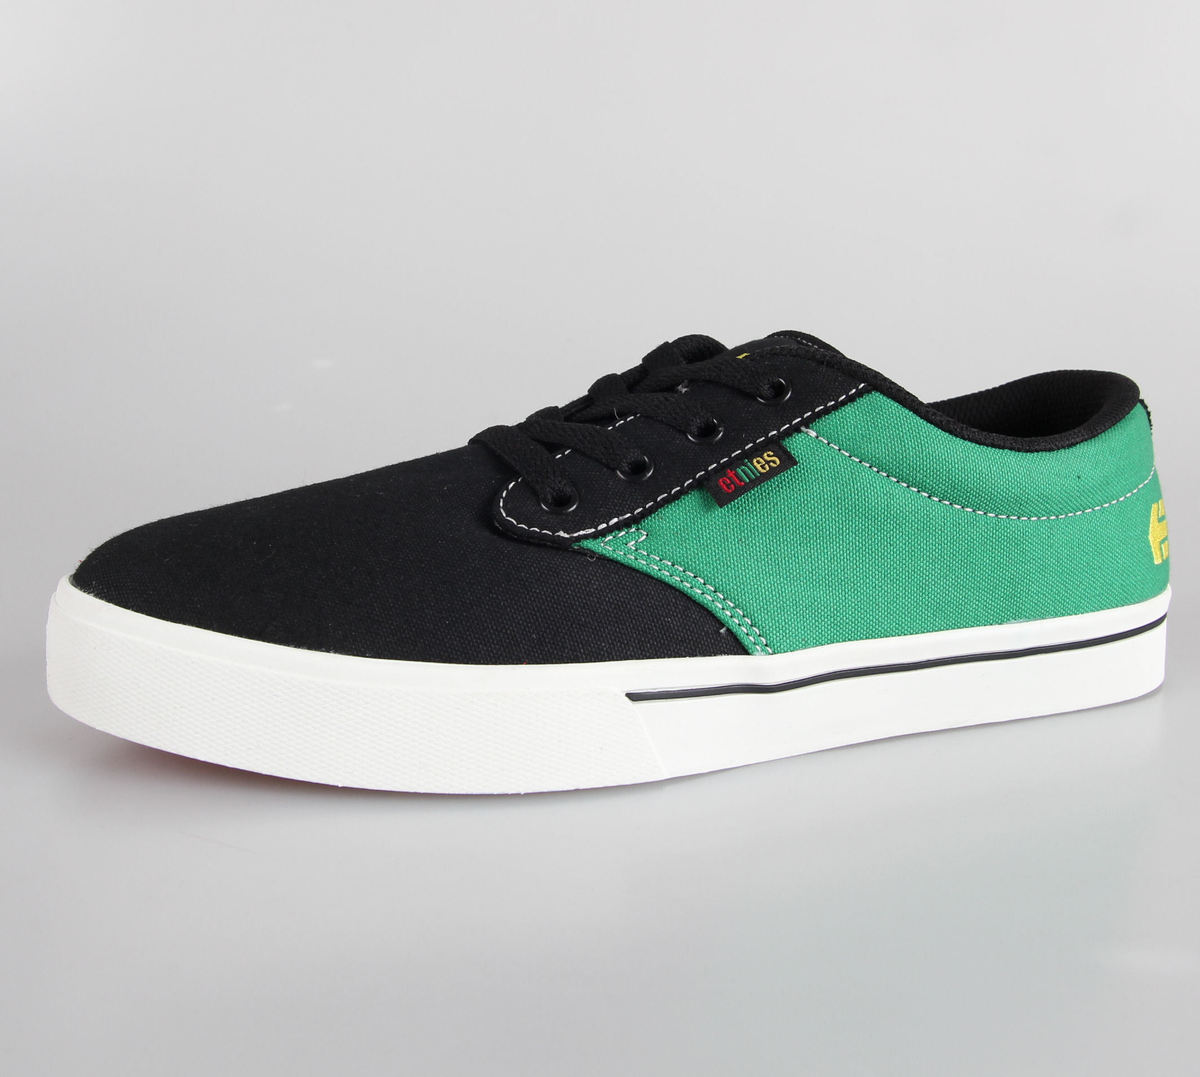 boty pánské ETNIES - Jameson 2 ECO - Black/Green